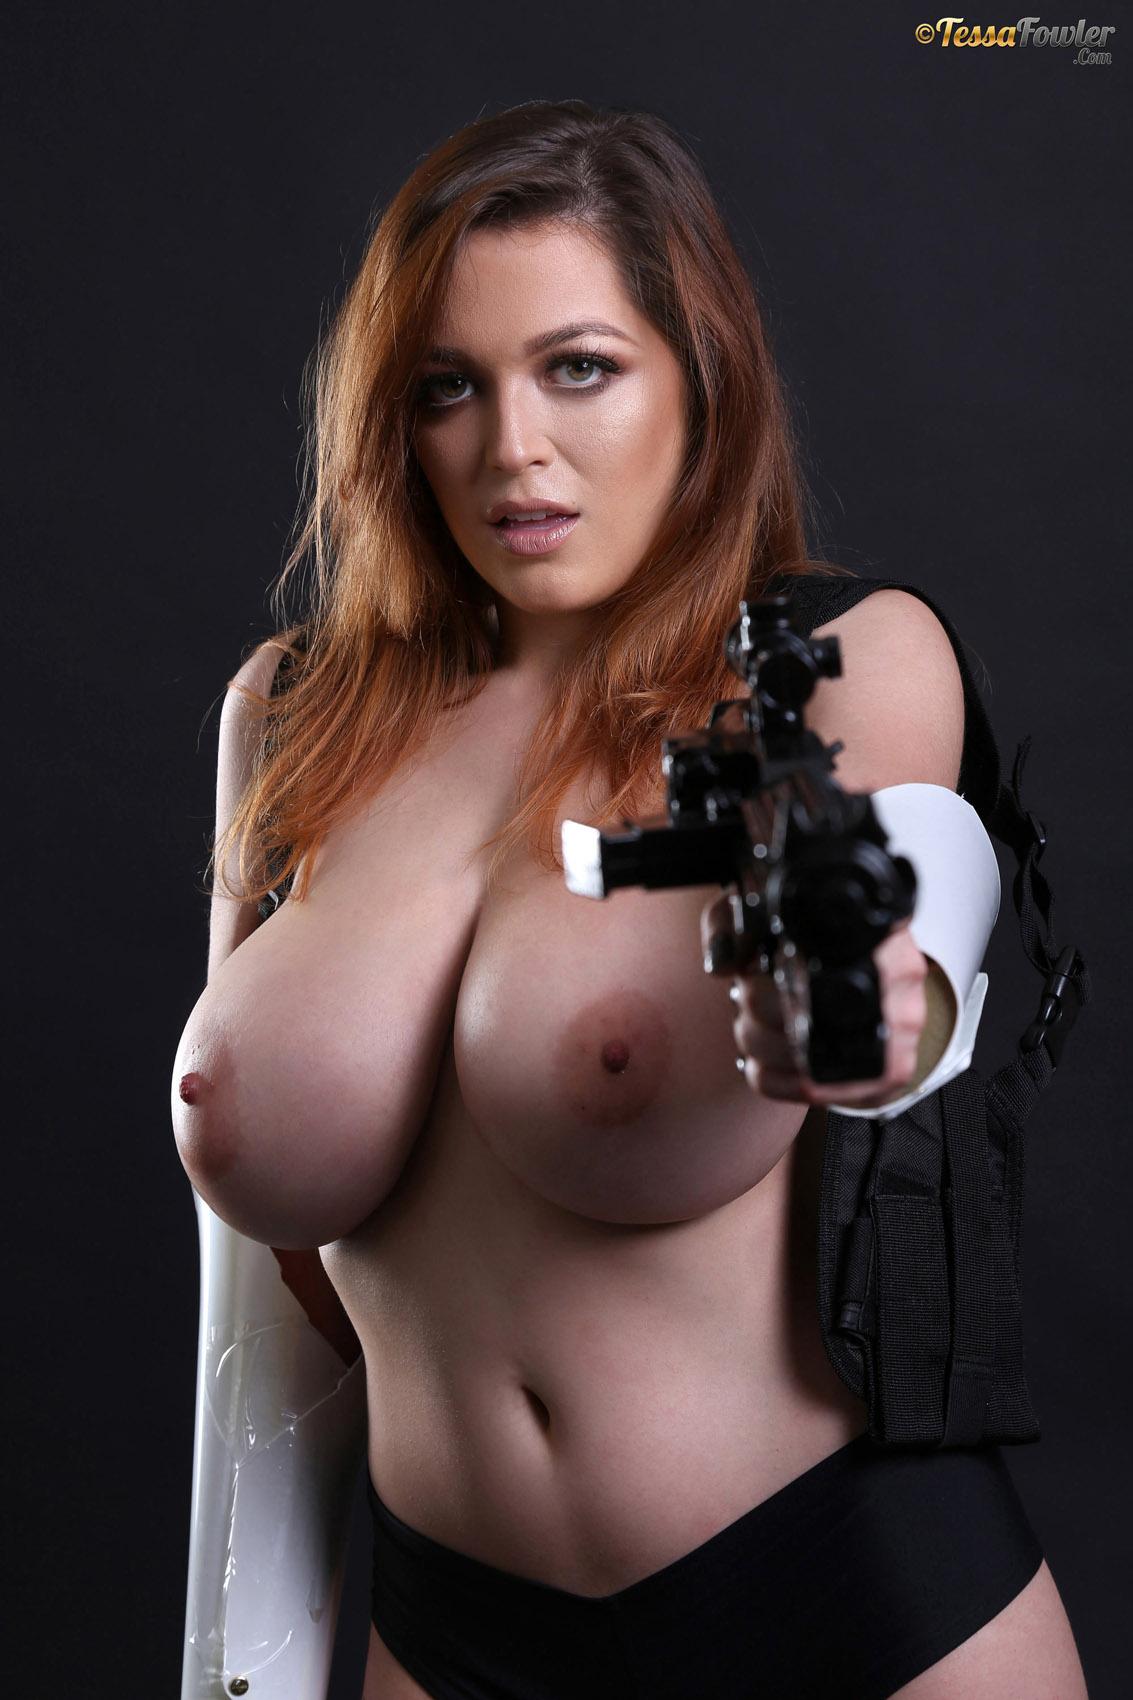 Tessa Fowler Striptease